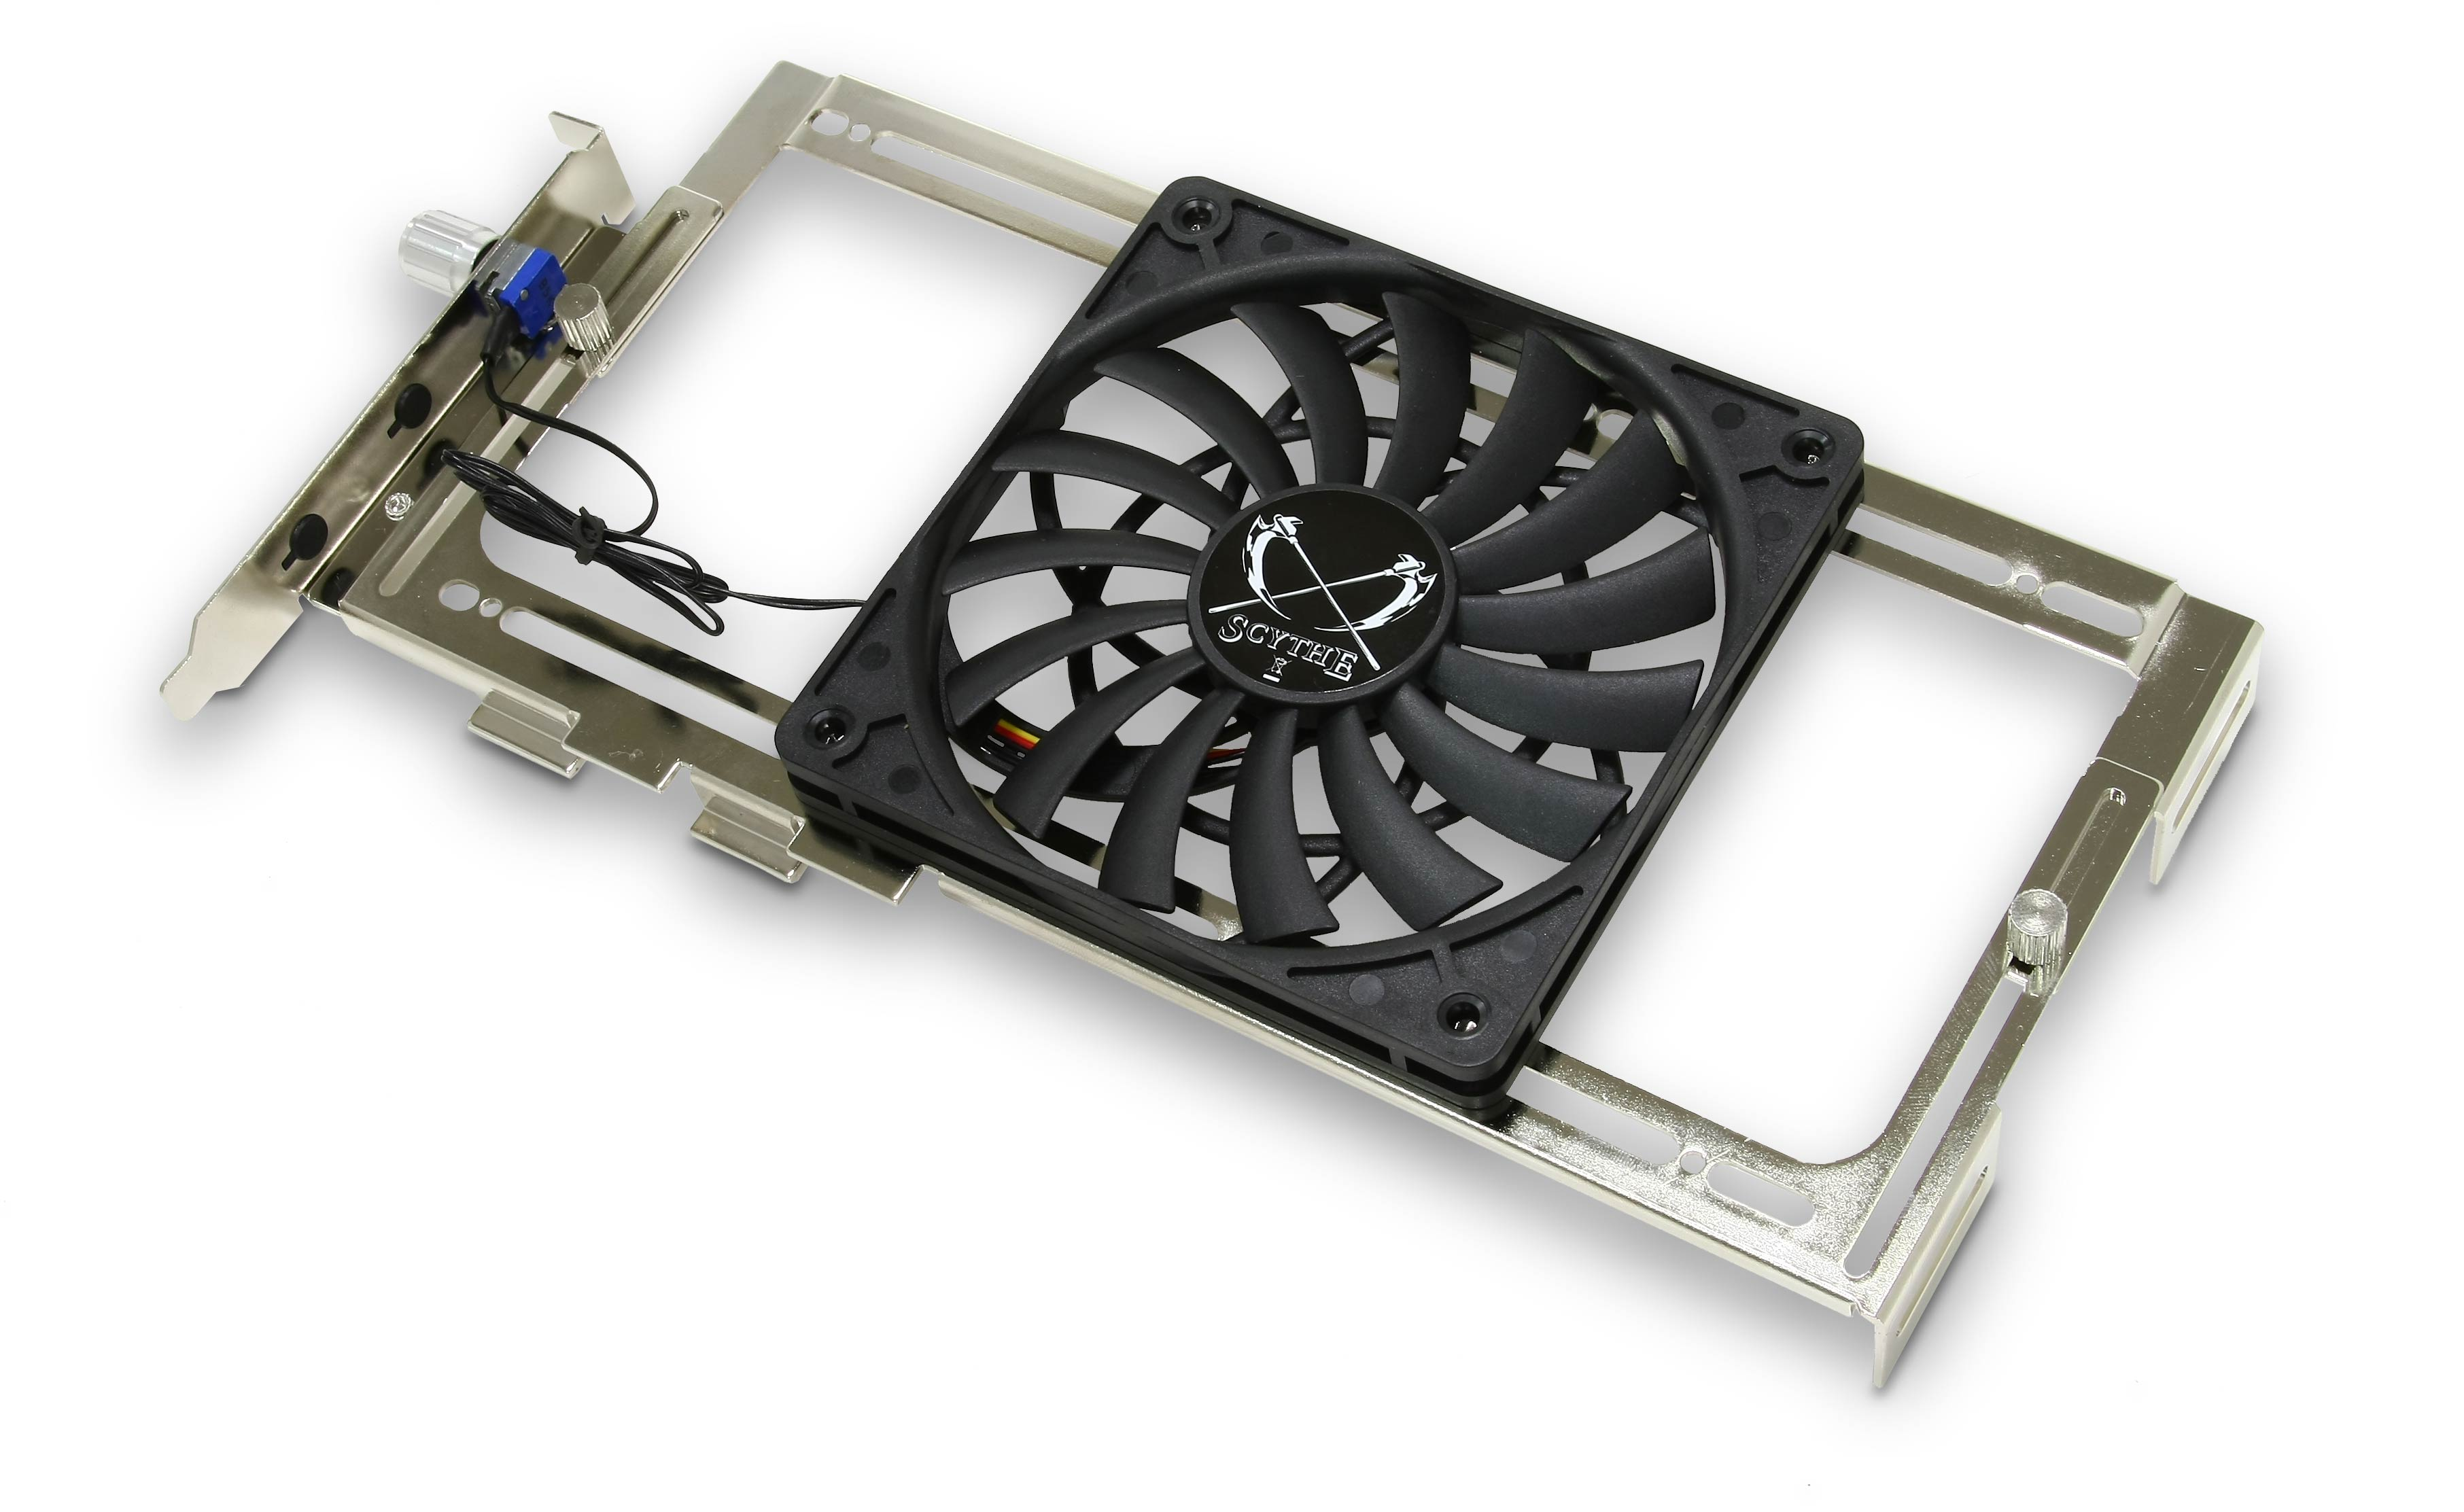 Kama Stay PCI Cooling Frame